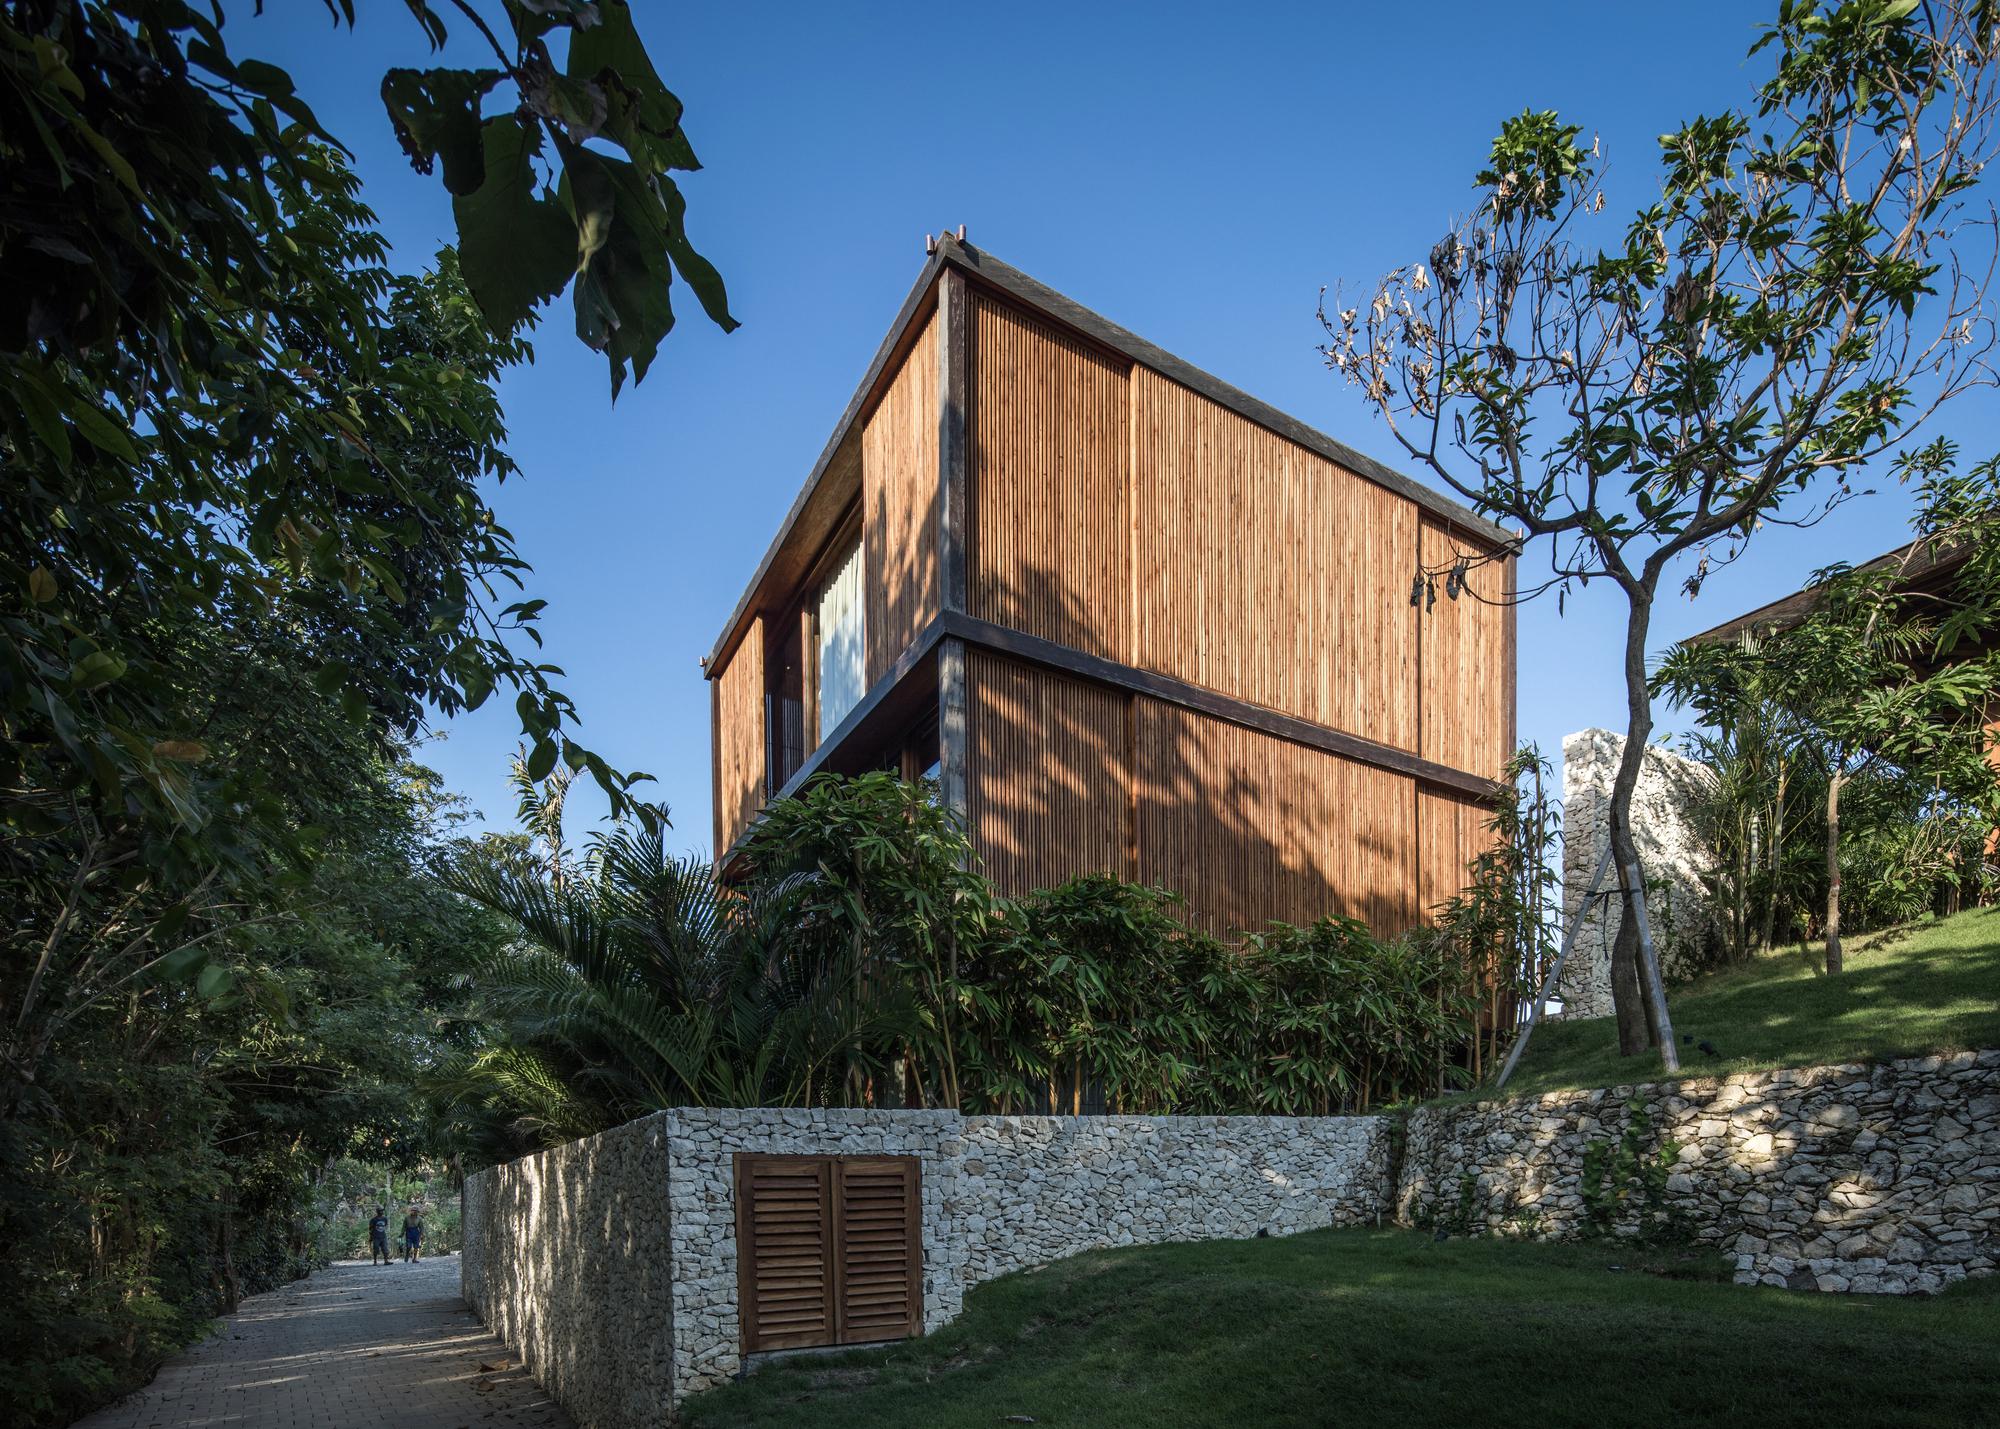 Gallery of House Aperture / Alexis Dornier - 1